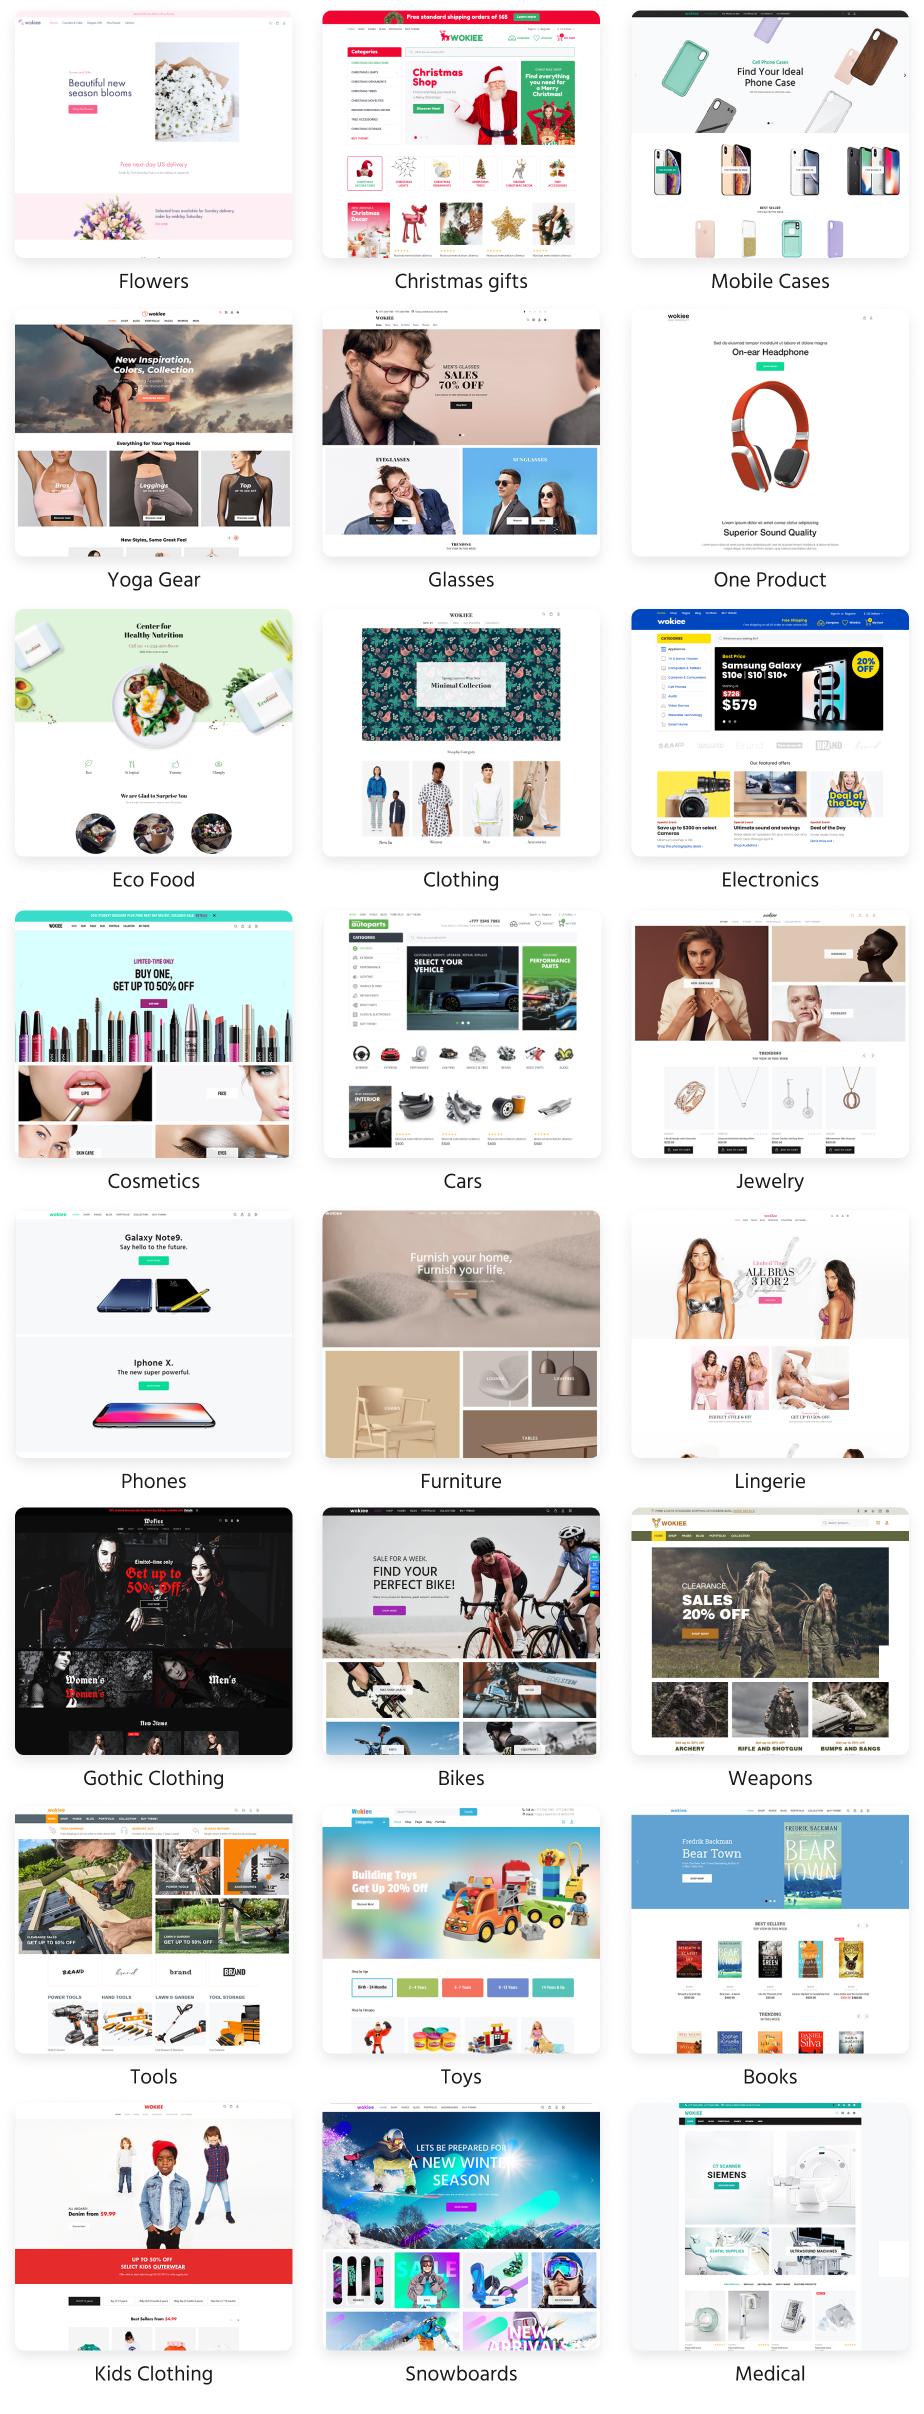 Wokiee - Multipurpose Shopify Theme - 22